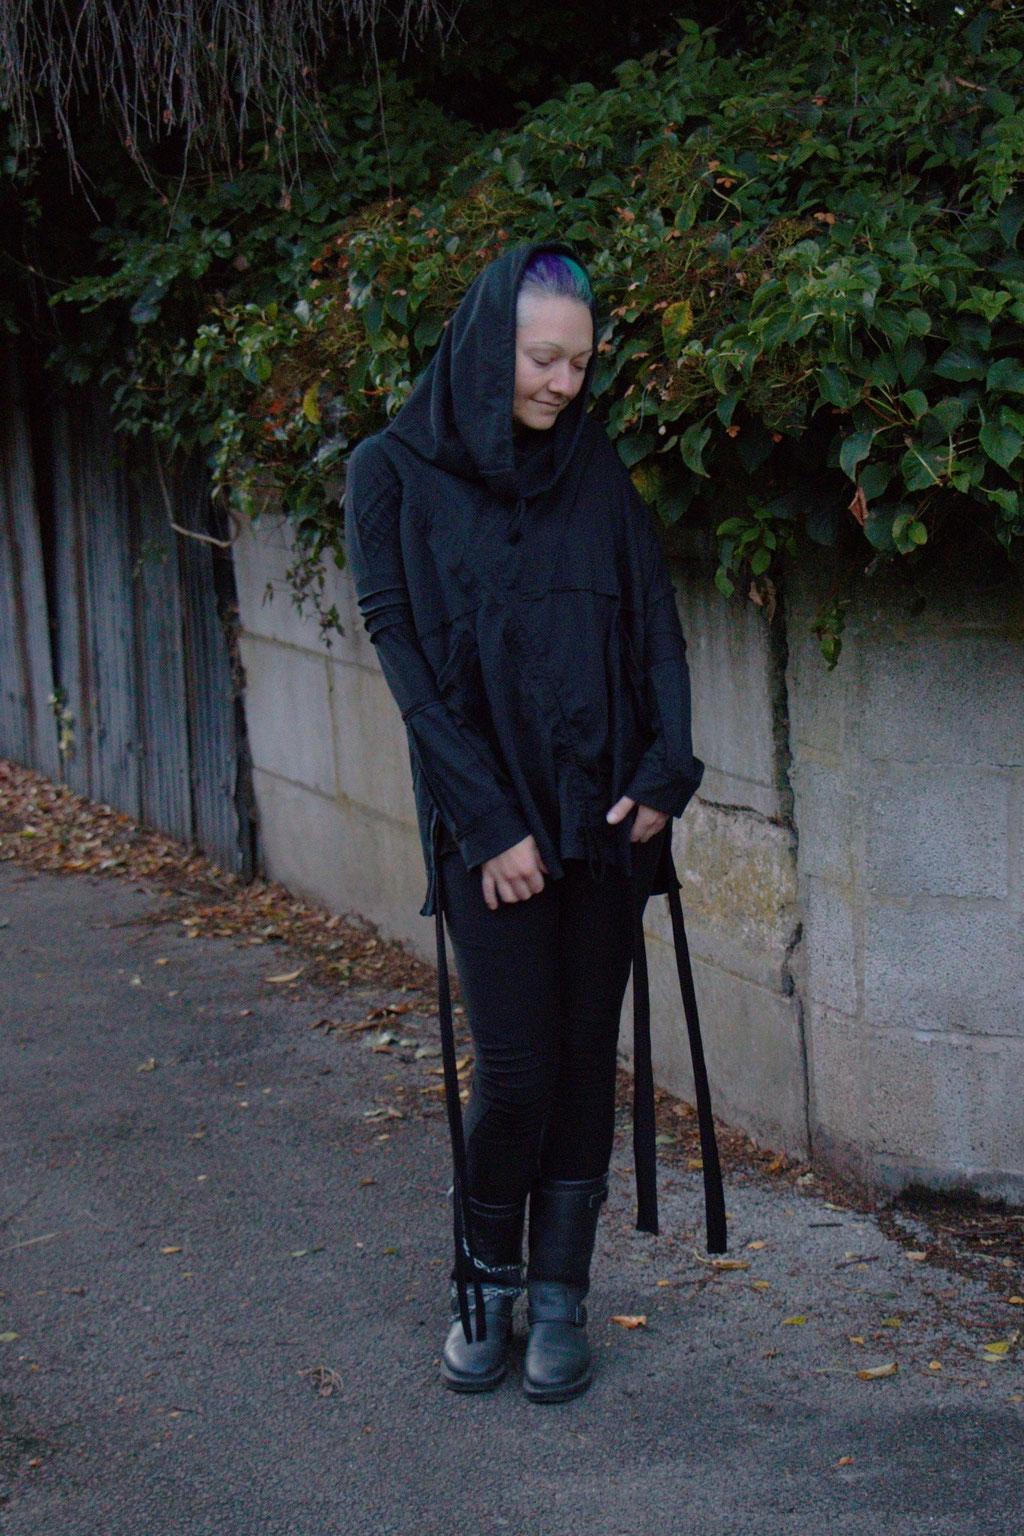 Dark post-apocalyptic outfits I wear to work - avant-garde look with Ynhoia and Dorawyn - Zebraspider Eco Anti-Fashion